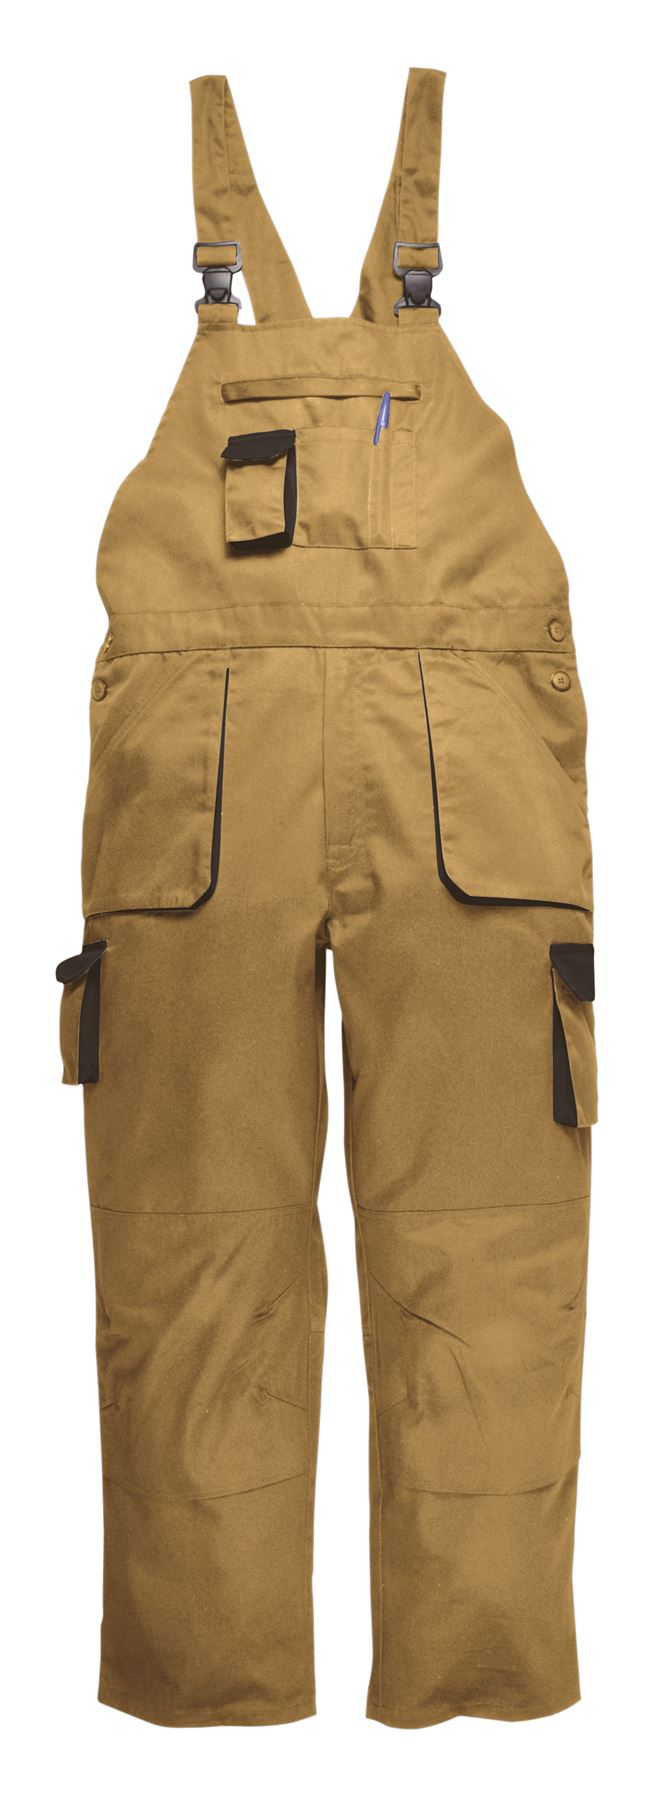 Portwest Texo Bib & Brace Knee Pad Pockets Elastic Back Trousers S - 4XL TX12